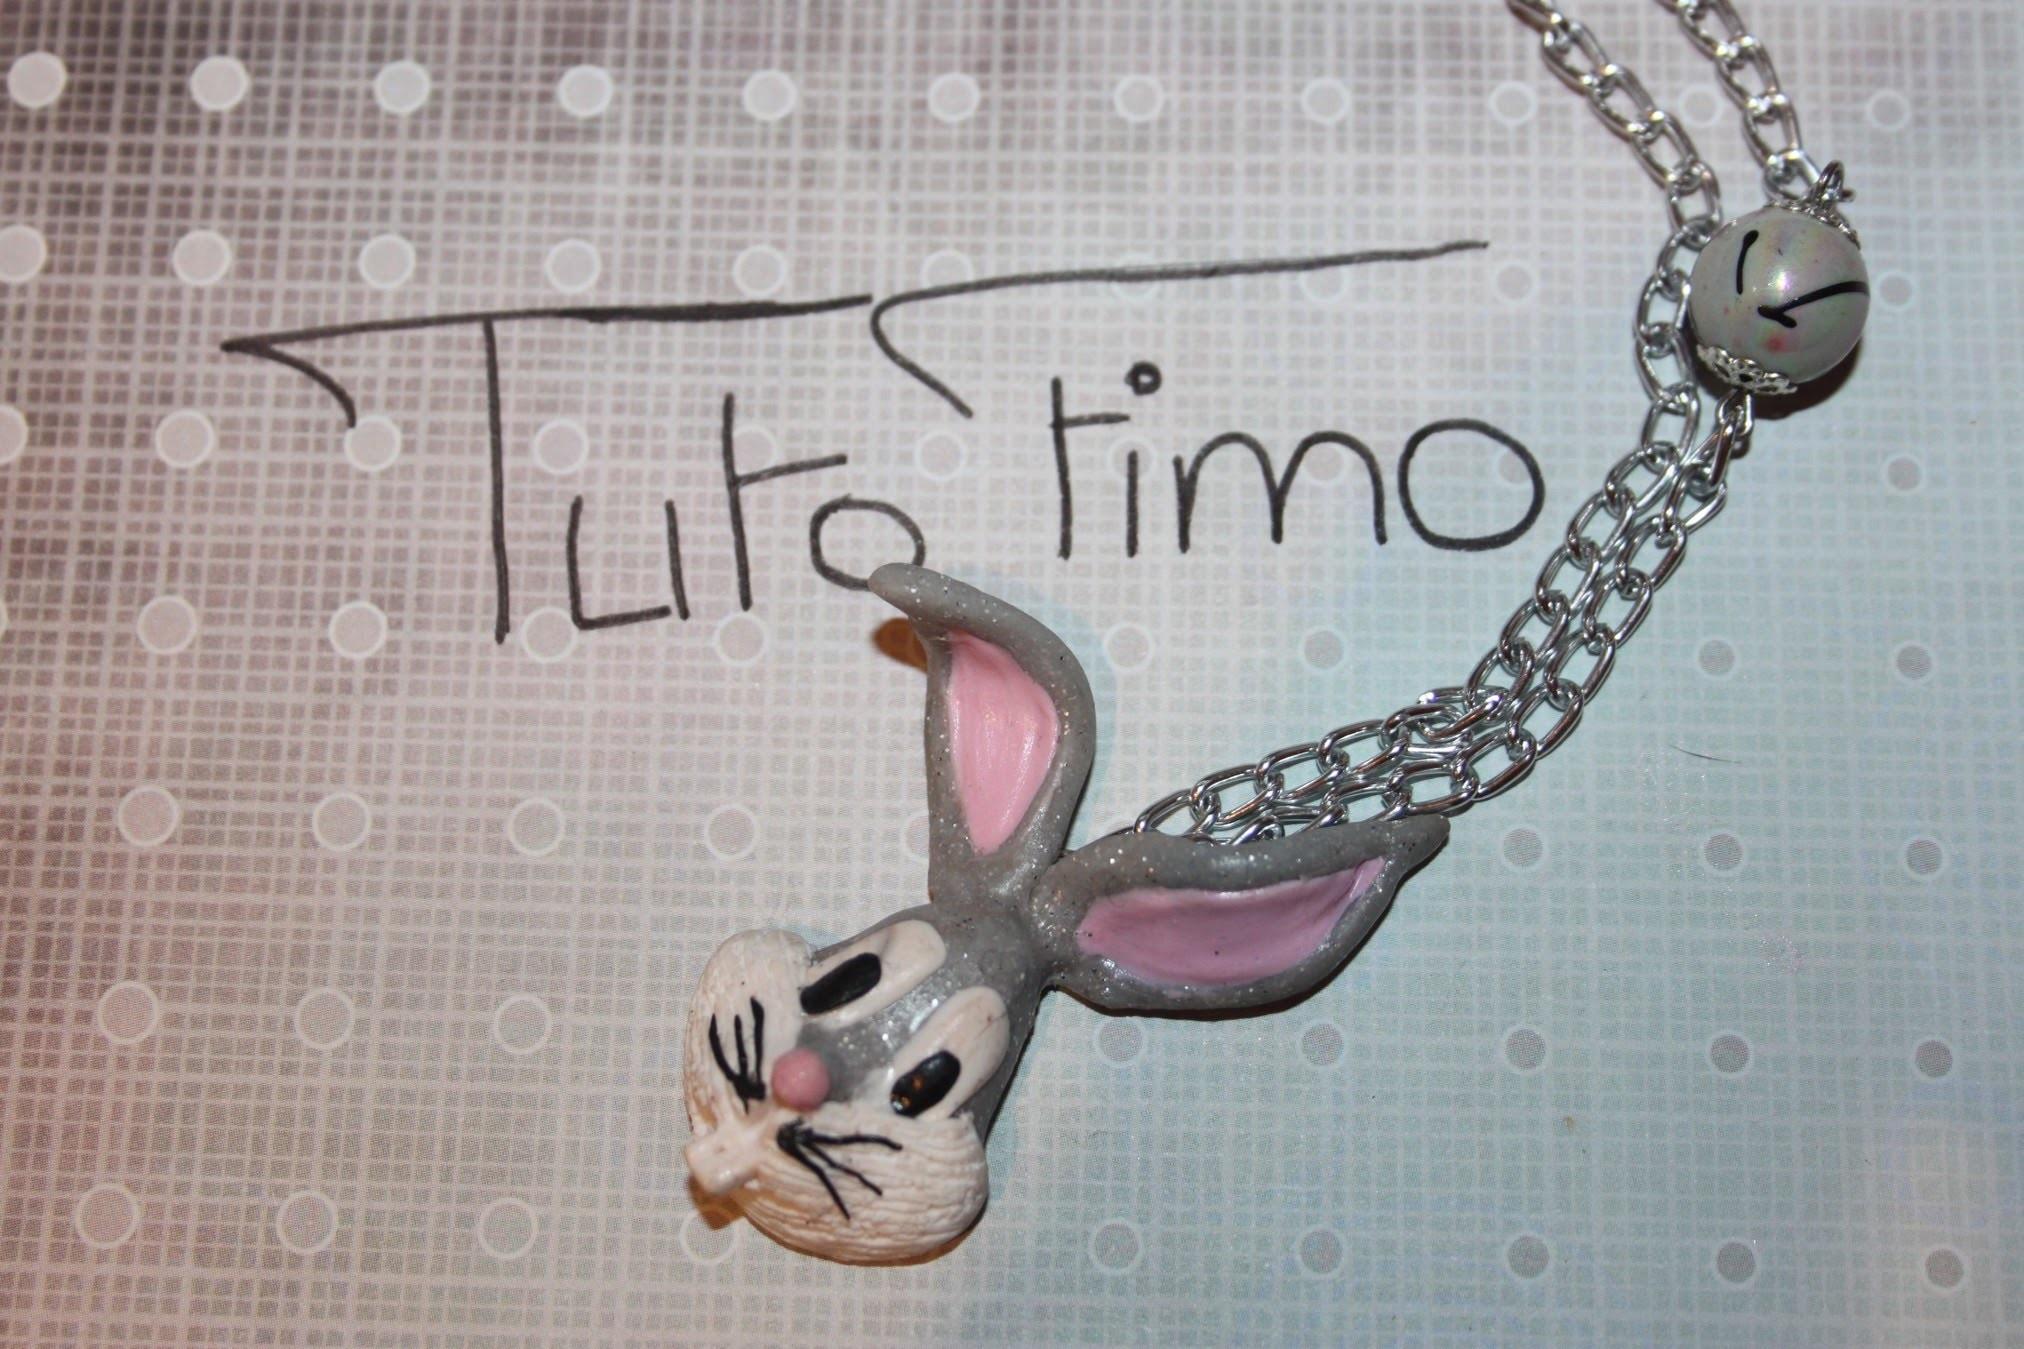 [♥✿ Tuto Fimo : Bugs Bunny ✿♥] ~ [♥✿ Polymer Clay Tutorial : Bugs Bunny✿♥]